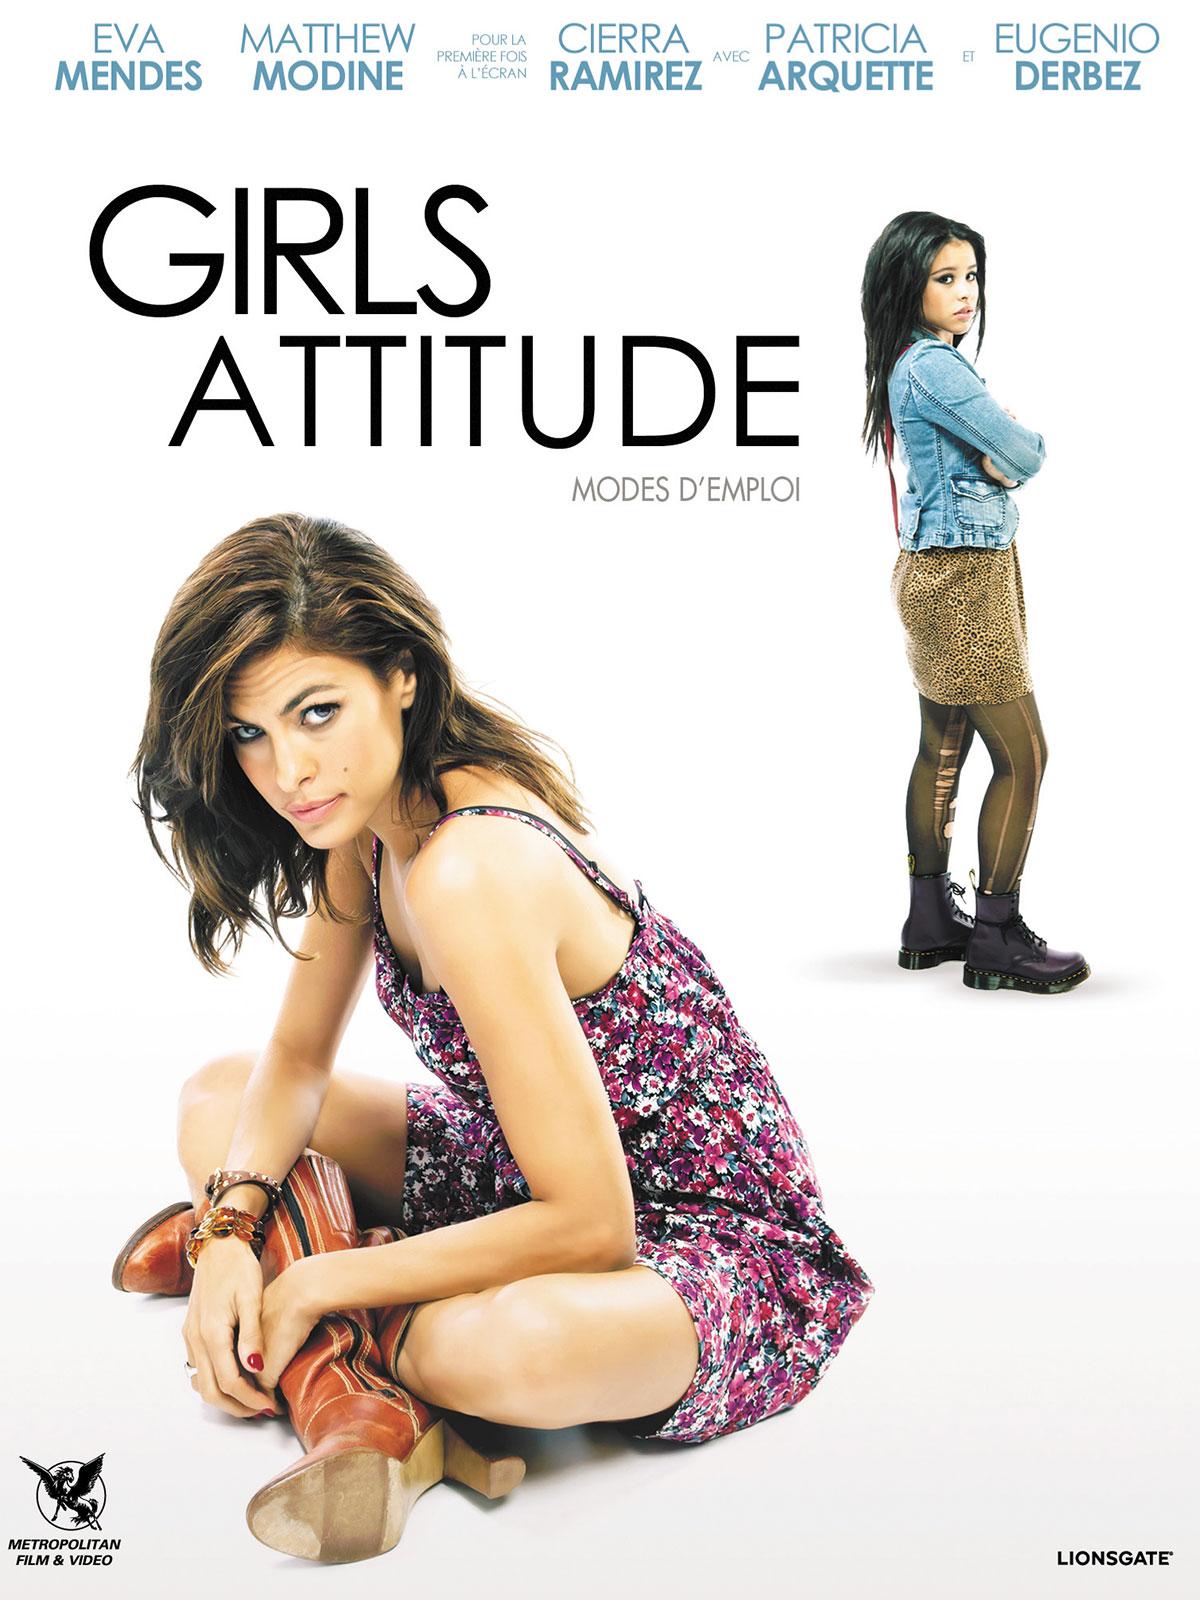 L'cole de l'adolescence COMPLET FILM PORNO TubeGold